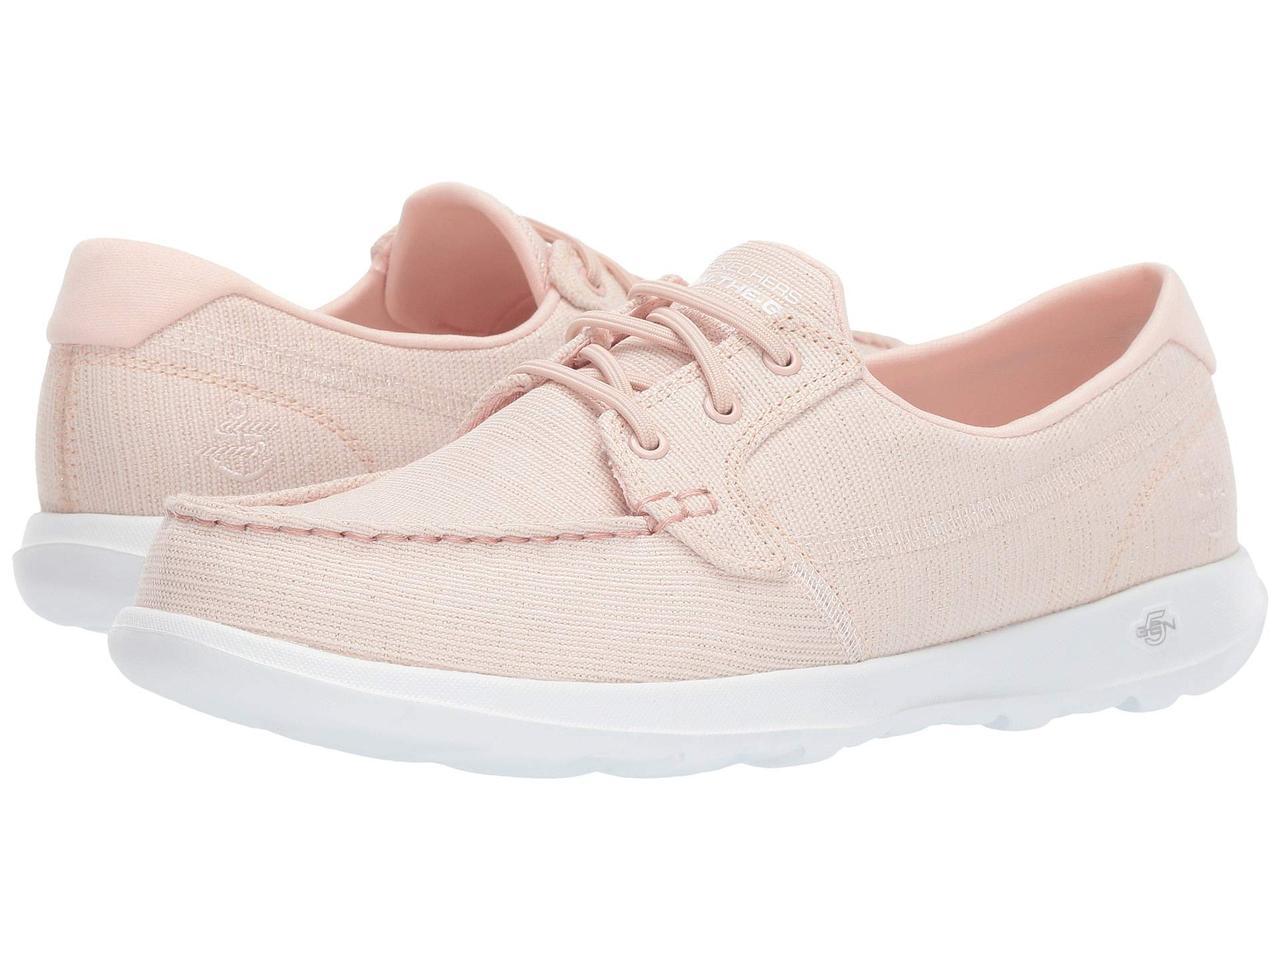 Кроссовки/Кеды (Оригинал) SKECHERS Performance Go Walk Lite - 16422 Light Pink